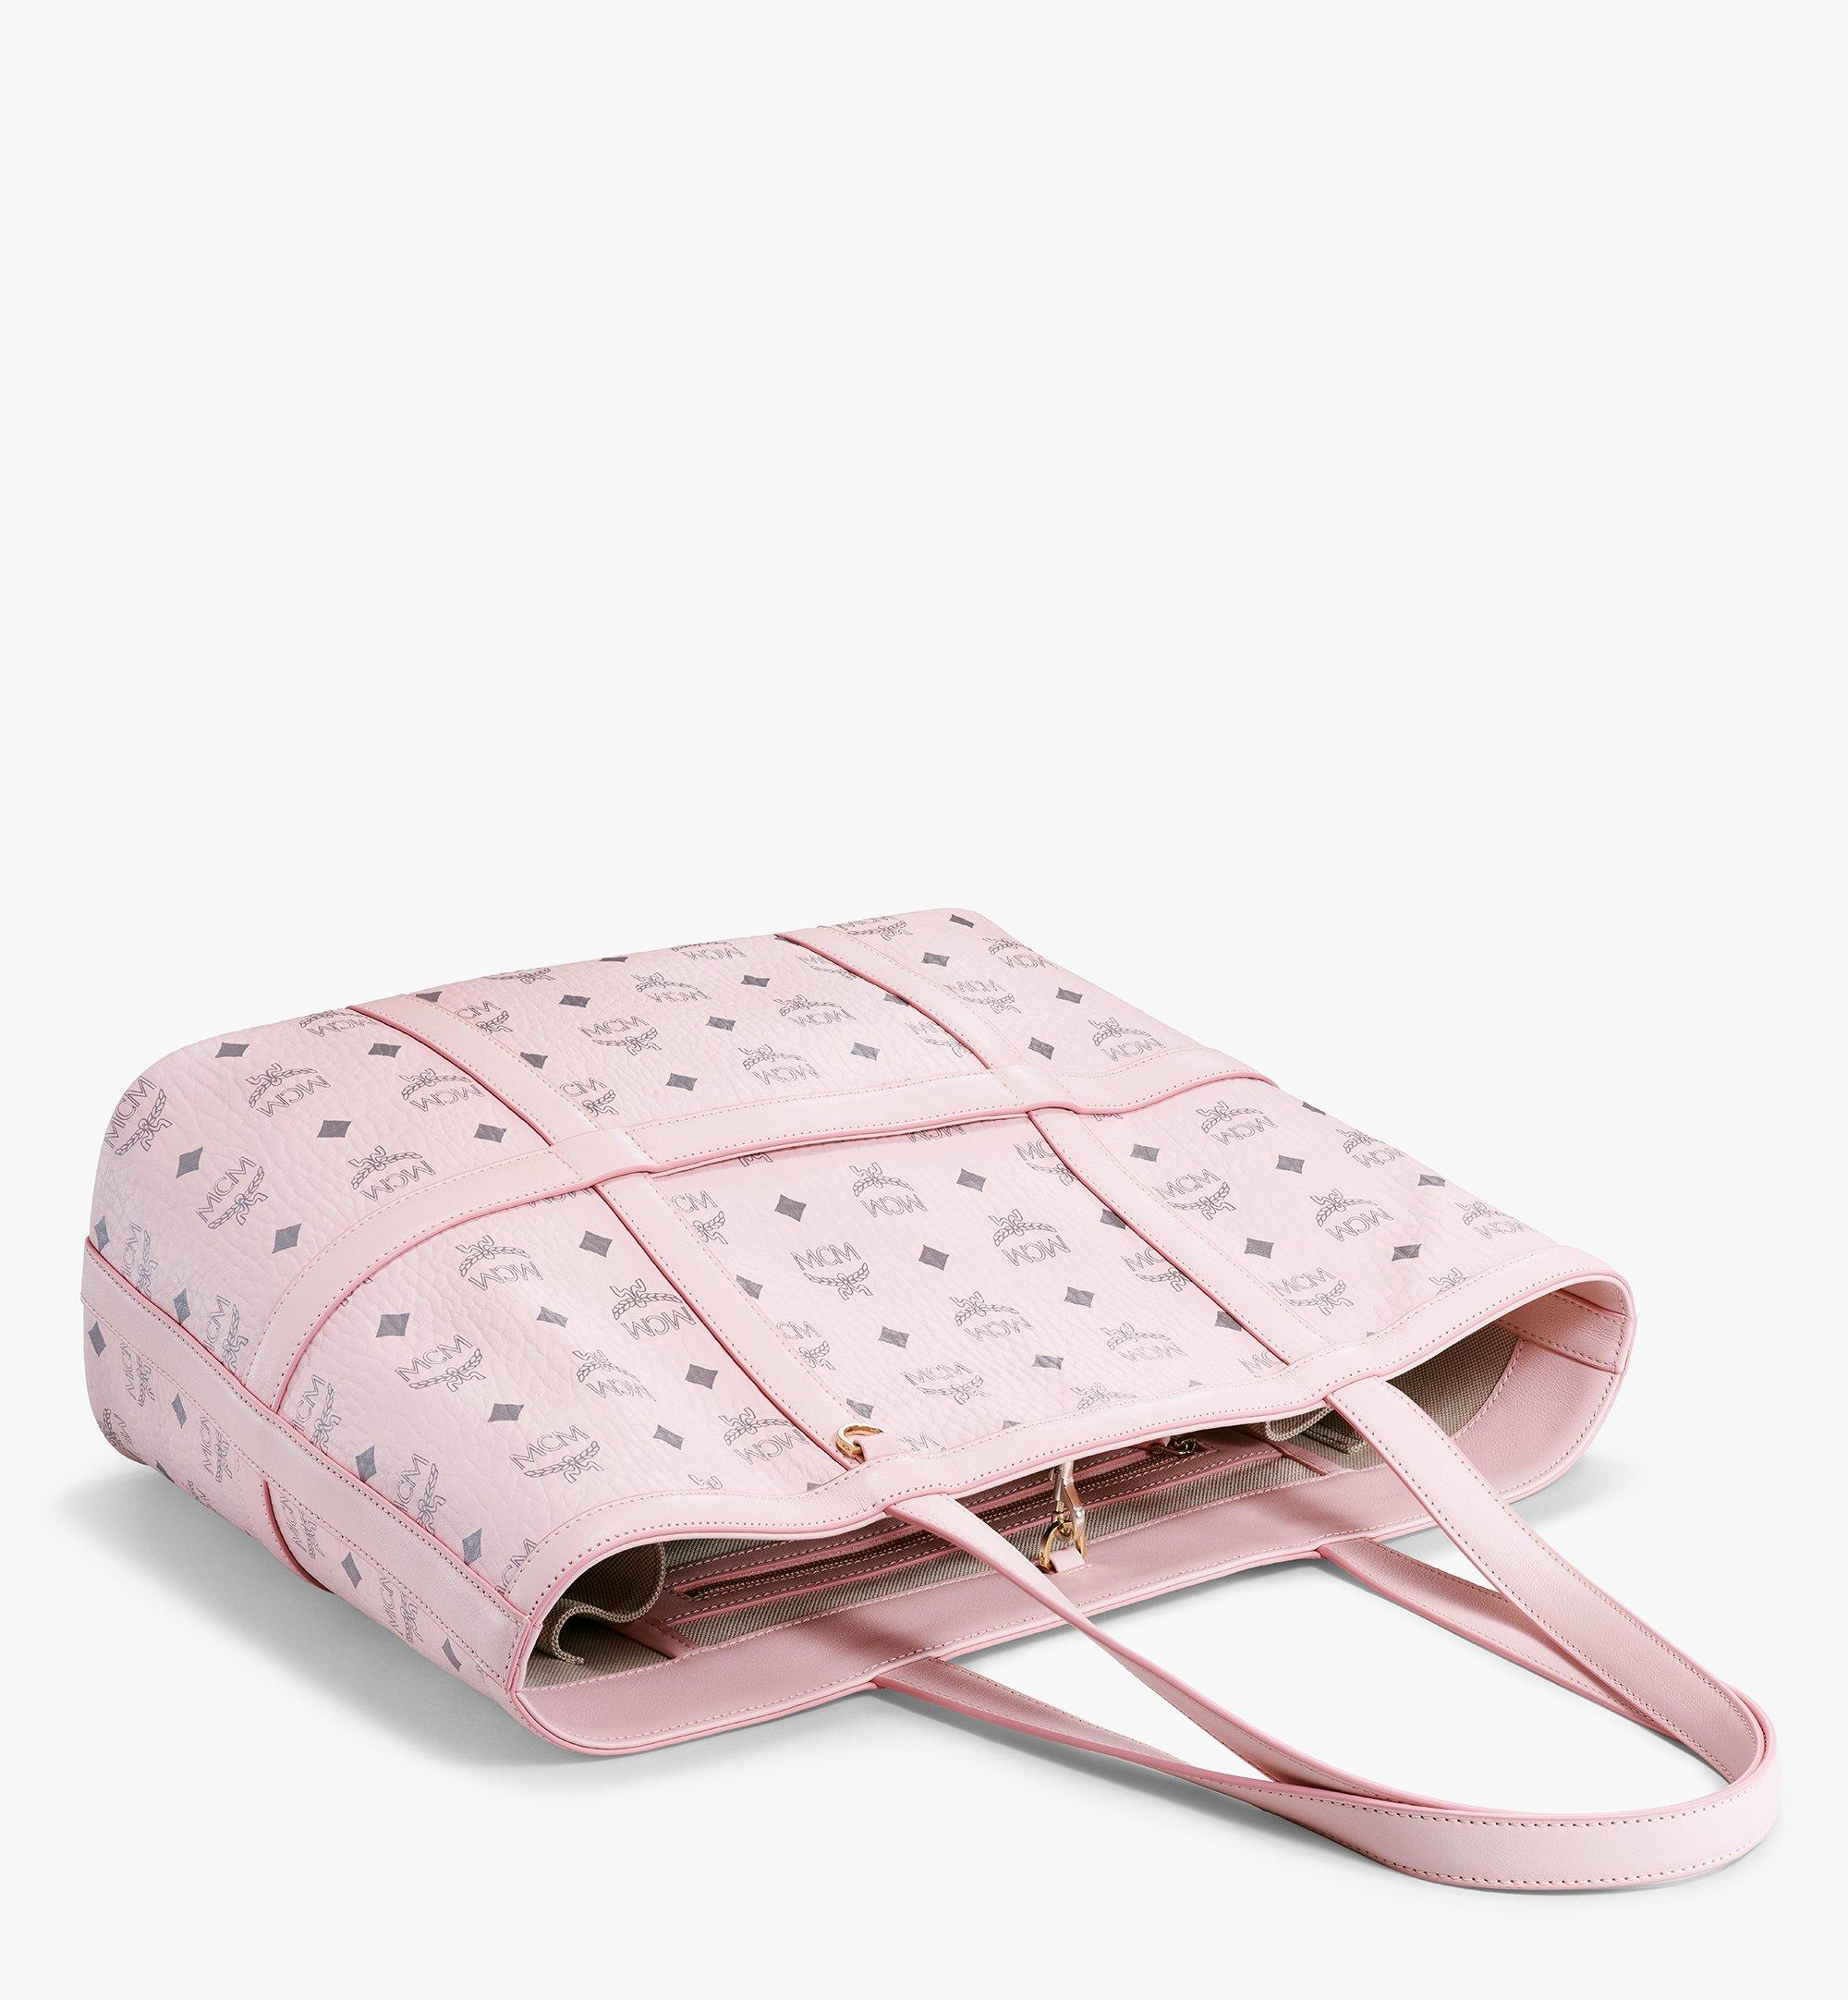 MCM Delmy Shopper in Visetos Pink MWPBSER01QH001 Alternate View 2